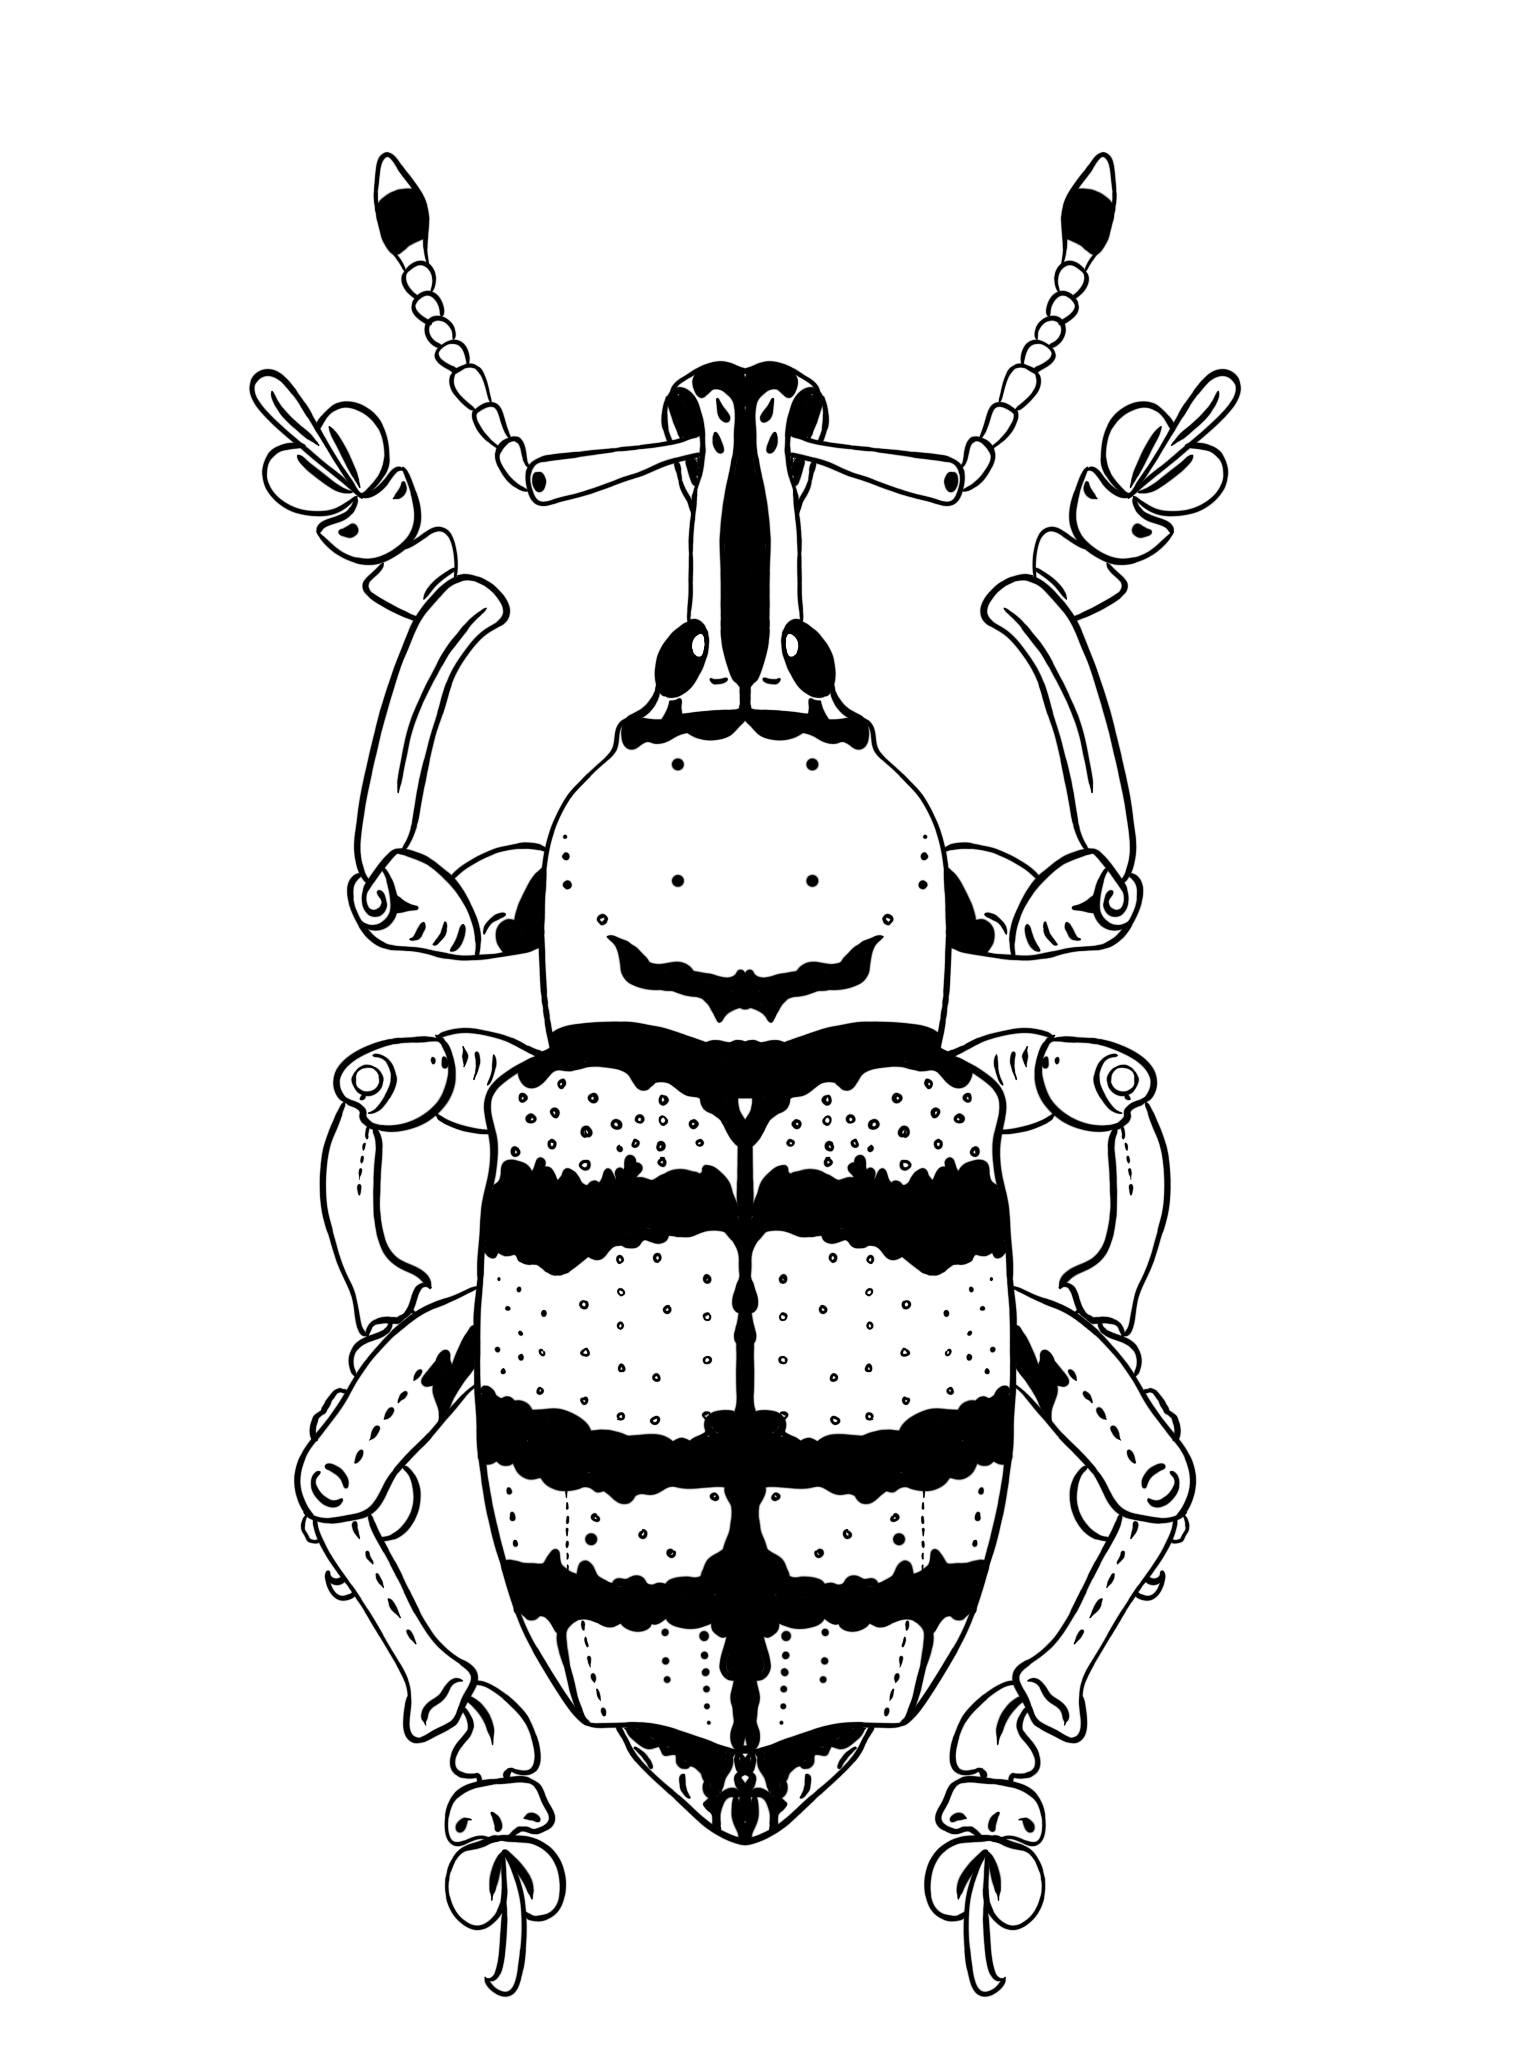 B&W Weevil